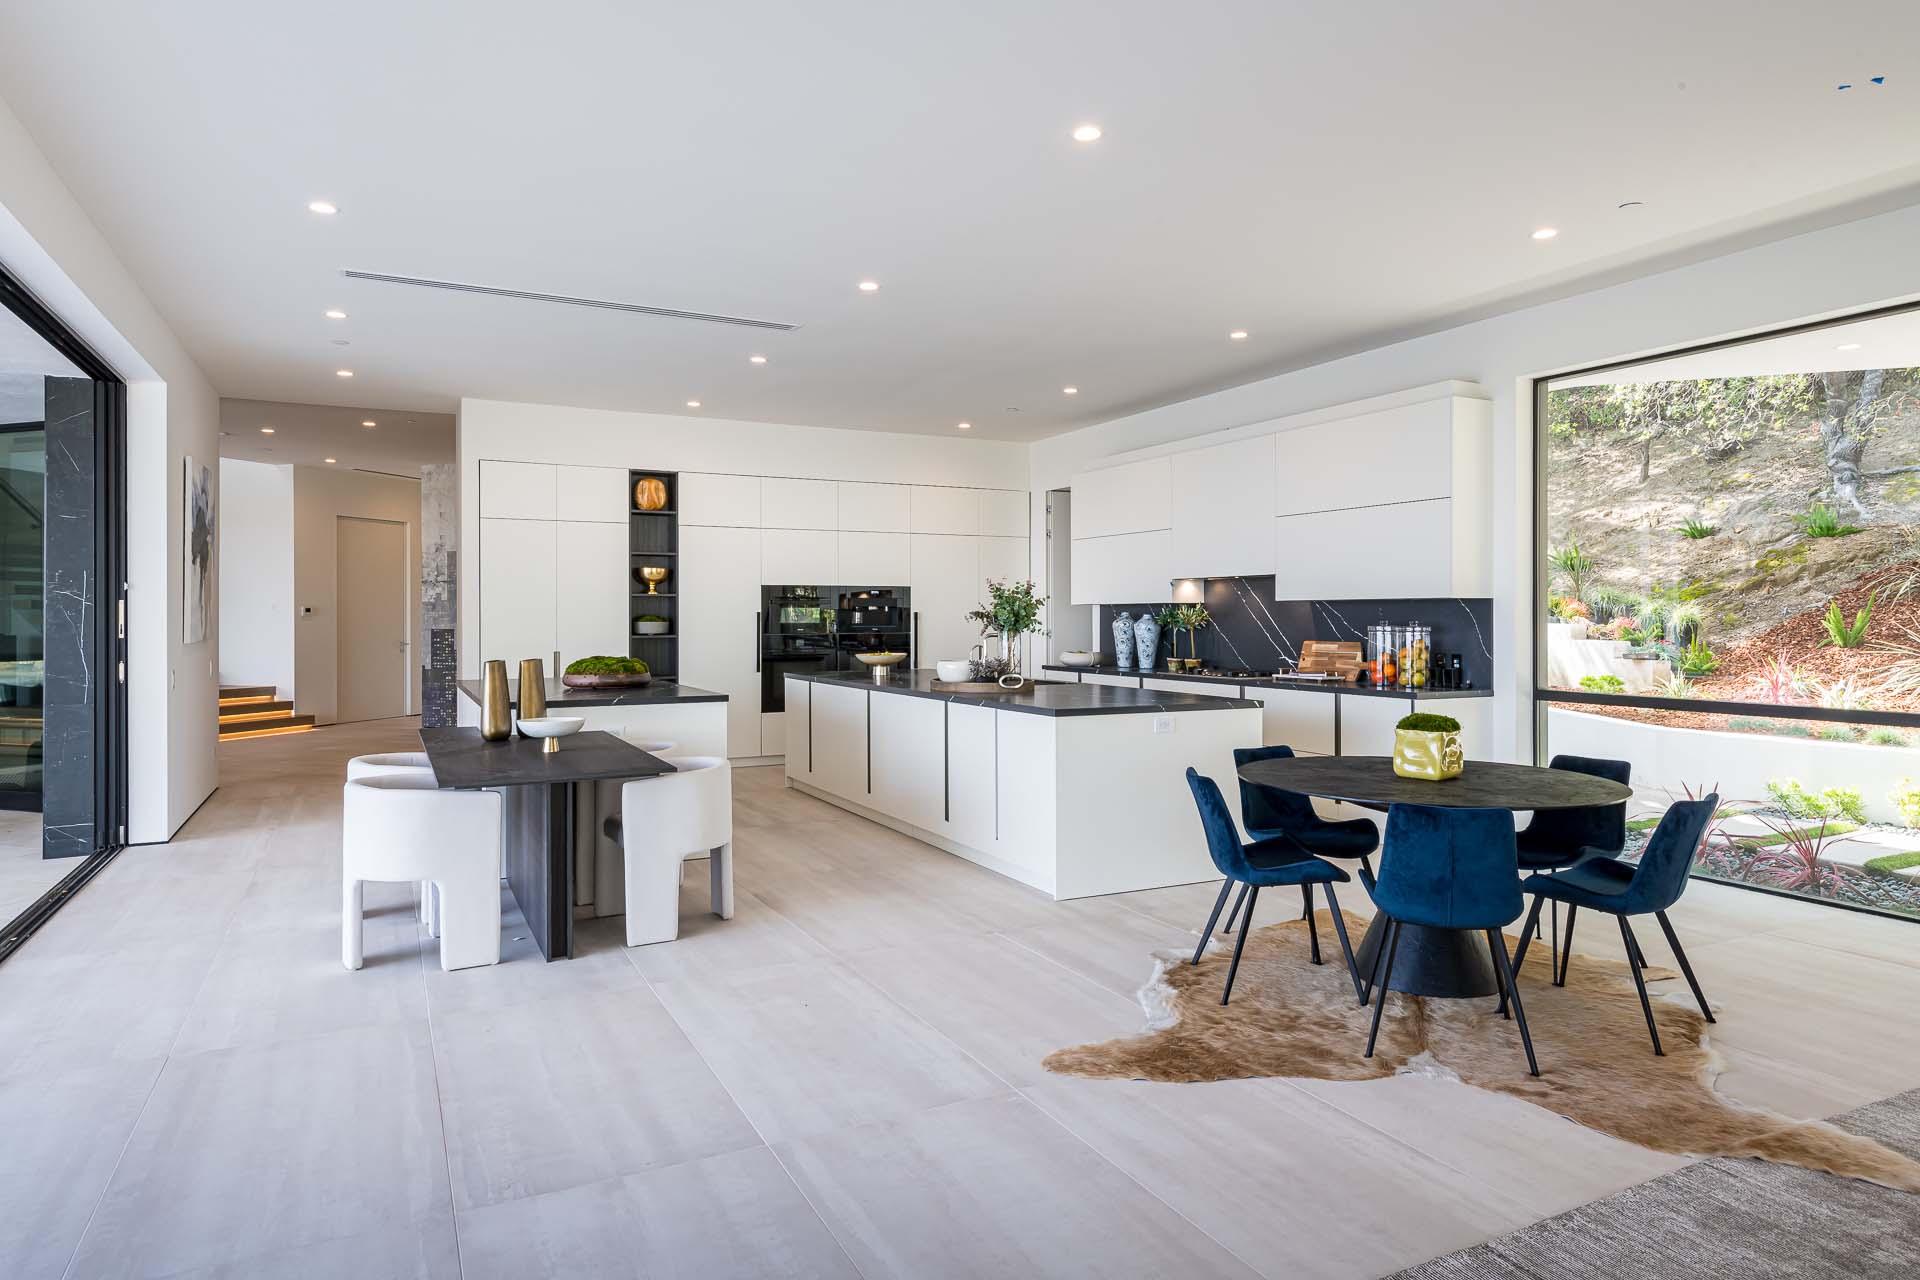 Cucina Moderna_Lounge_cucina laccata